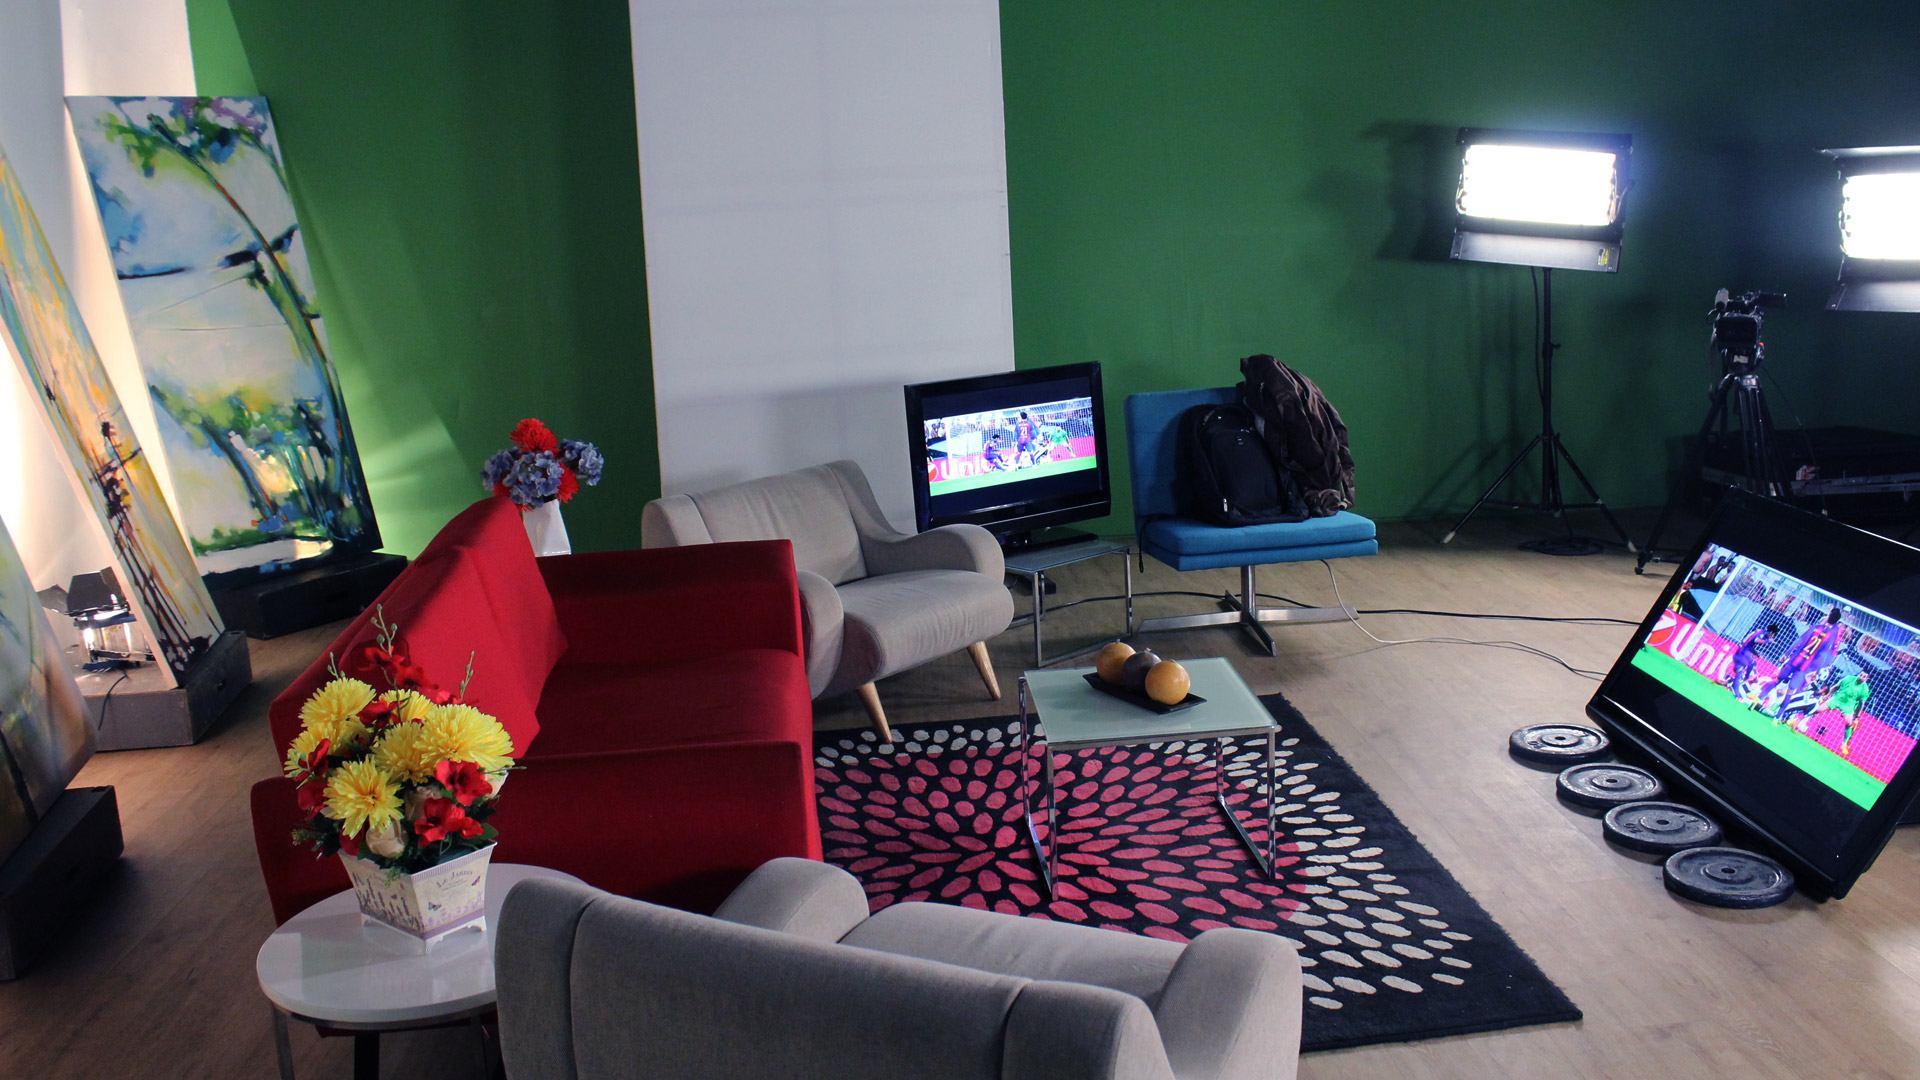 Estudio RPTV Image